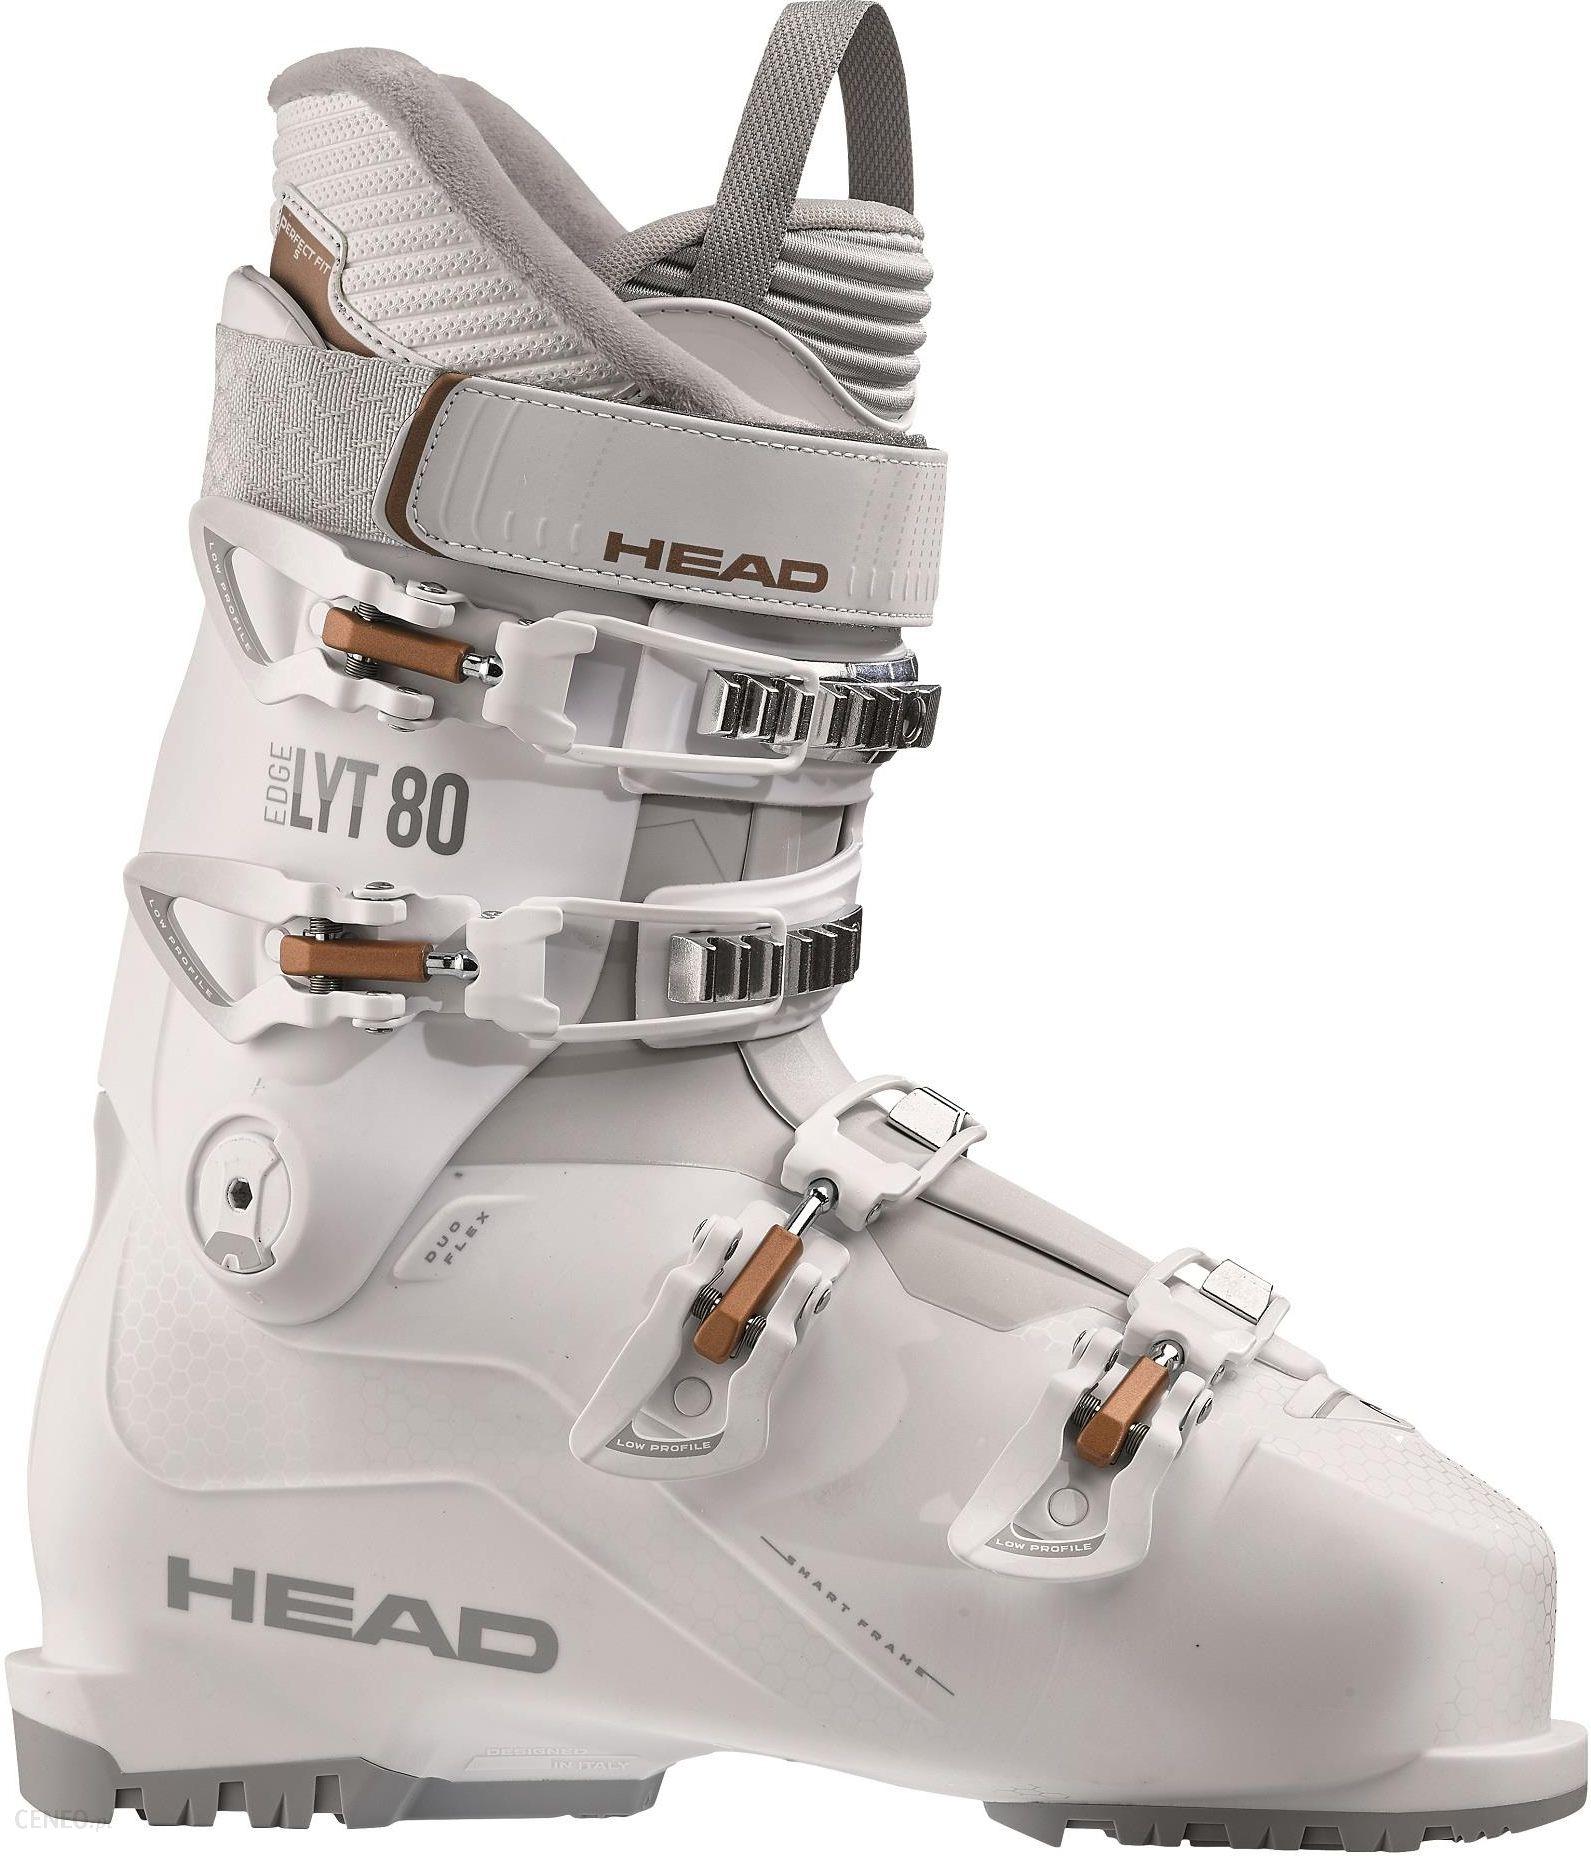 Buty narciarskie Head Edge LYT 100 W BlackWhite sezon 2020